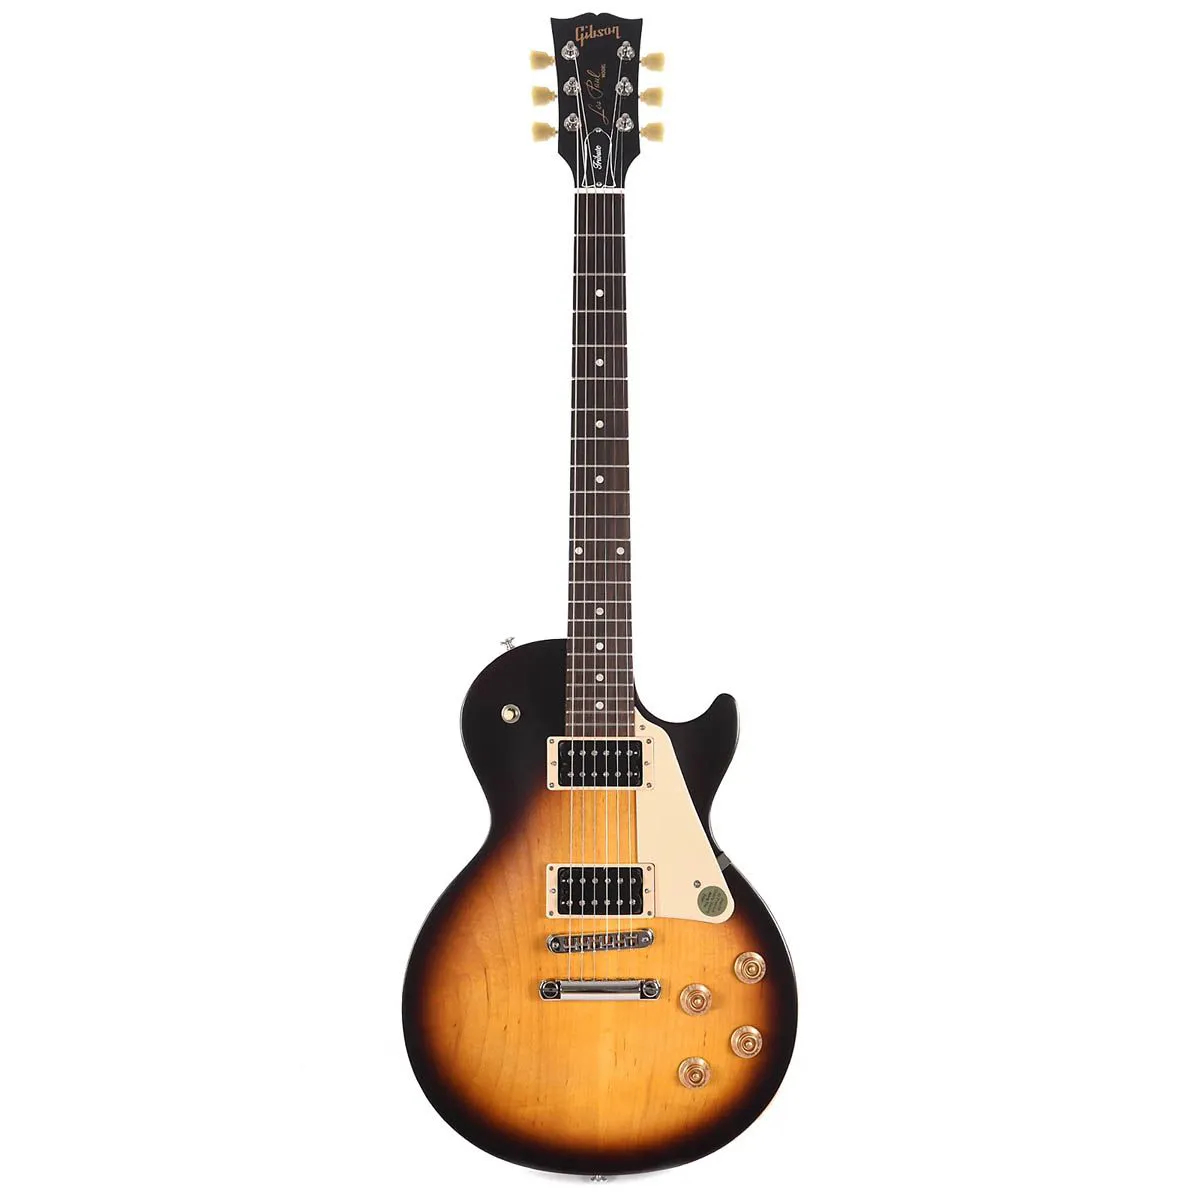 Guitarra Gibson Les Paul Studio Tribute 2019 Tobacco Burst